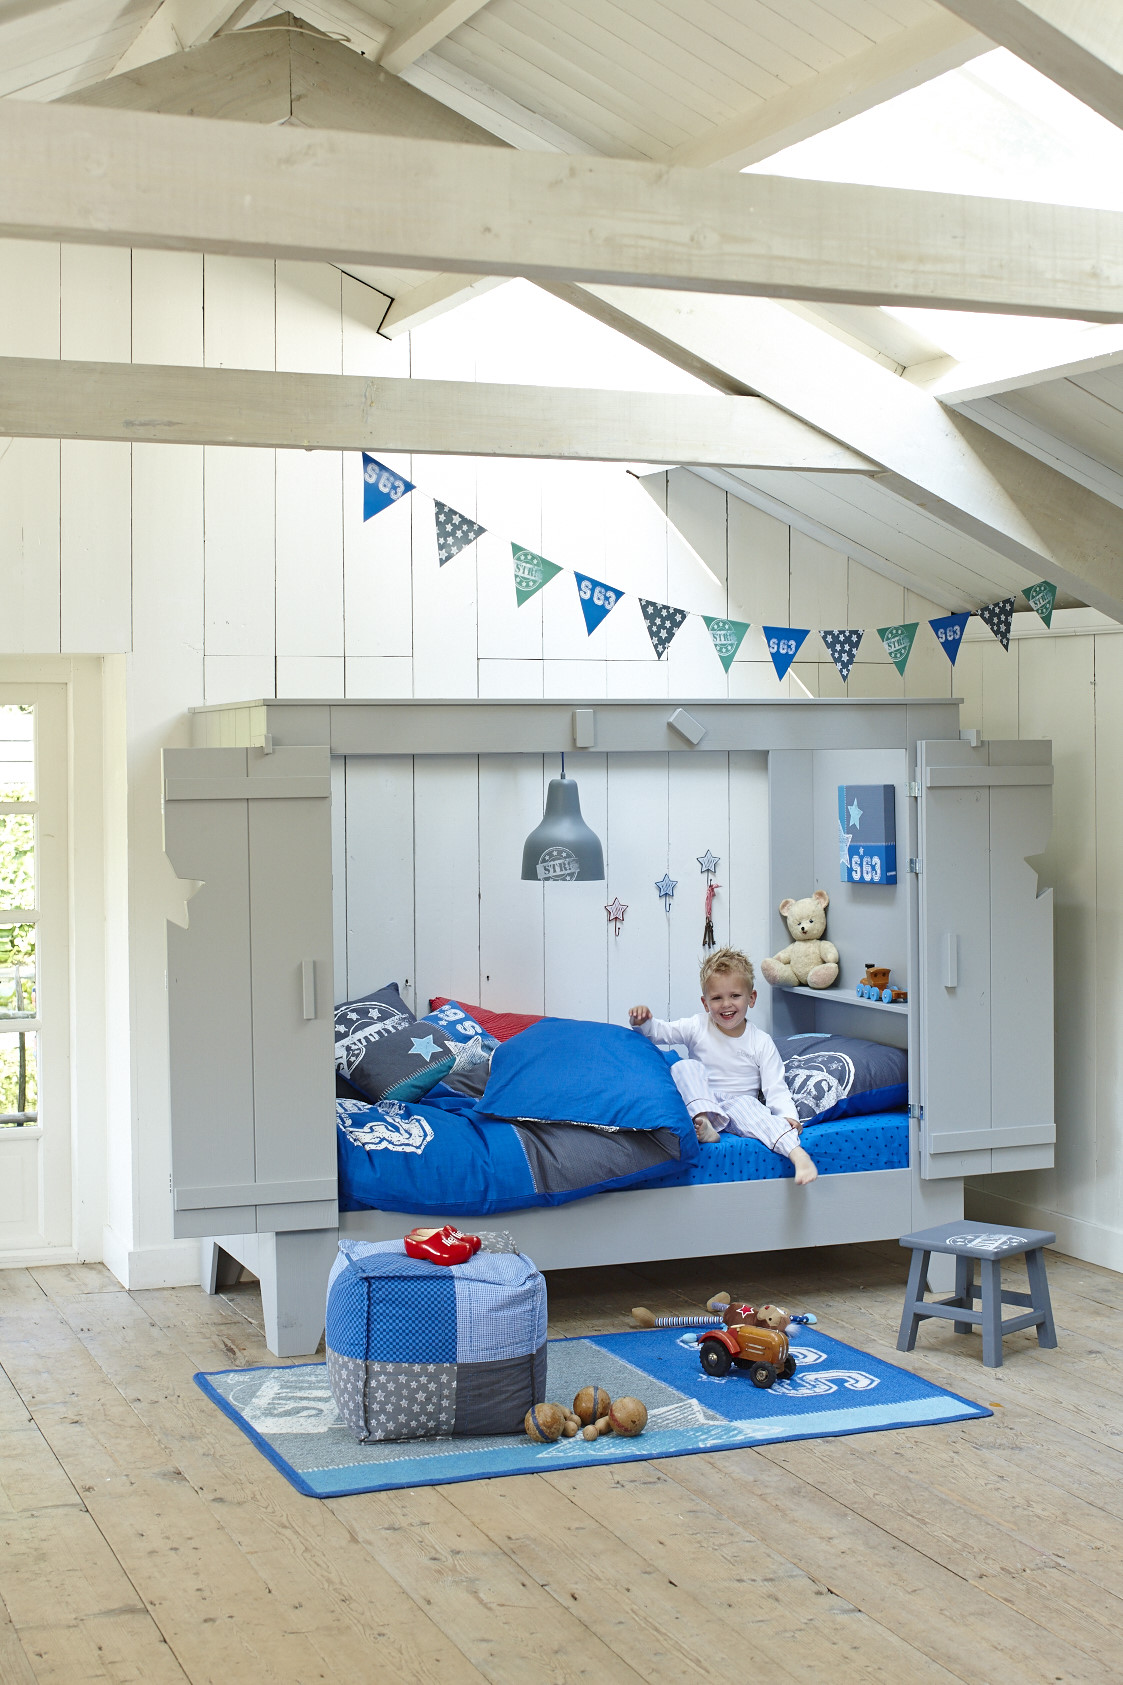 Awesome Leenbakker Slaapkamers Pictures - Huis & Interieur Ideeën ...